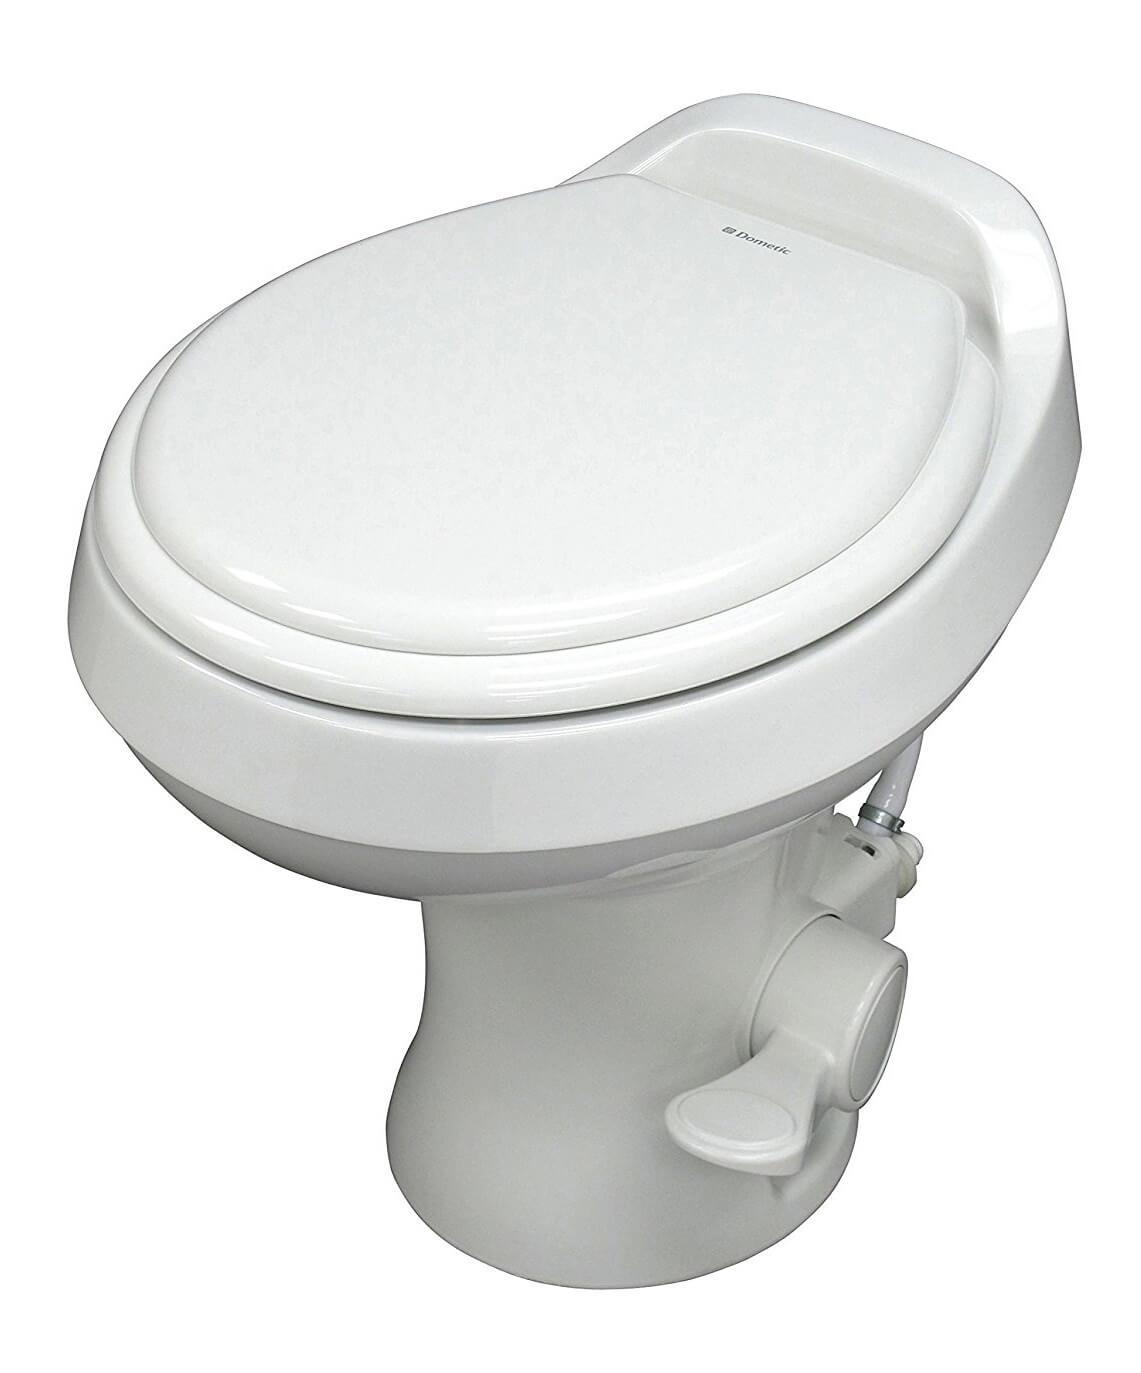 Dometic 300 Series Standard Height Toilet